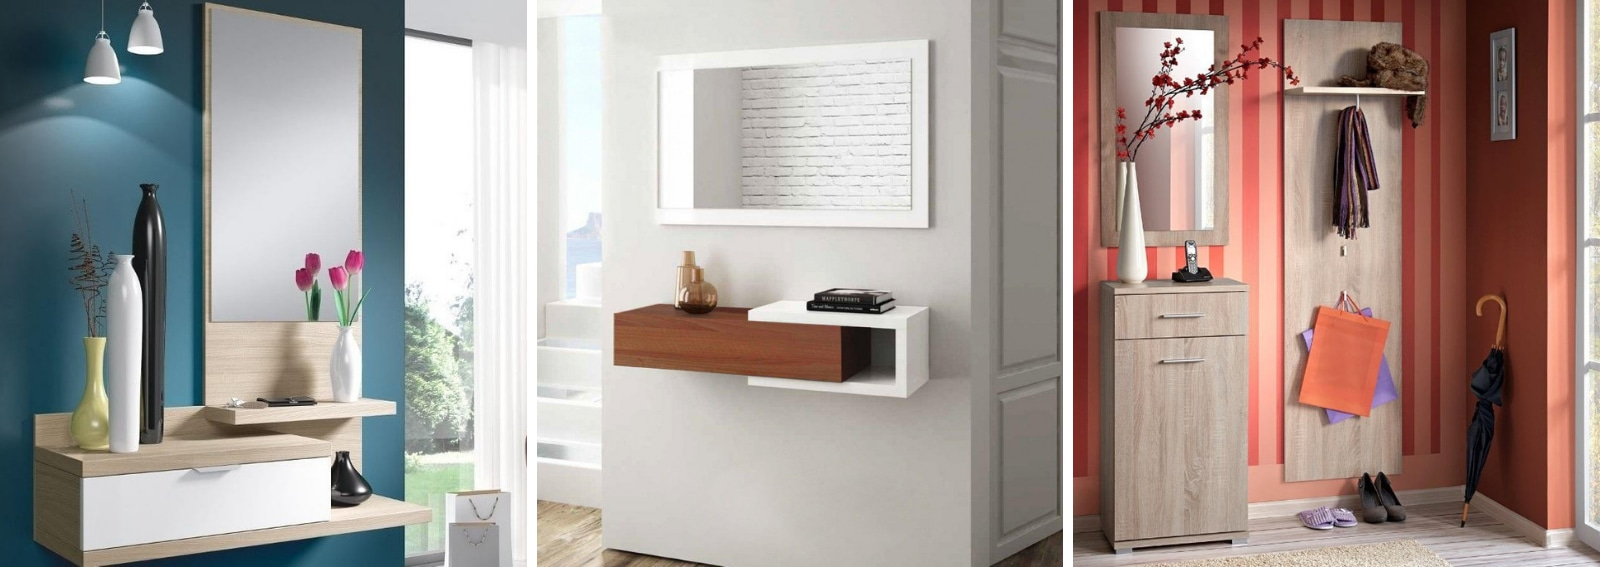 Ingresso moderno_desktop